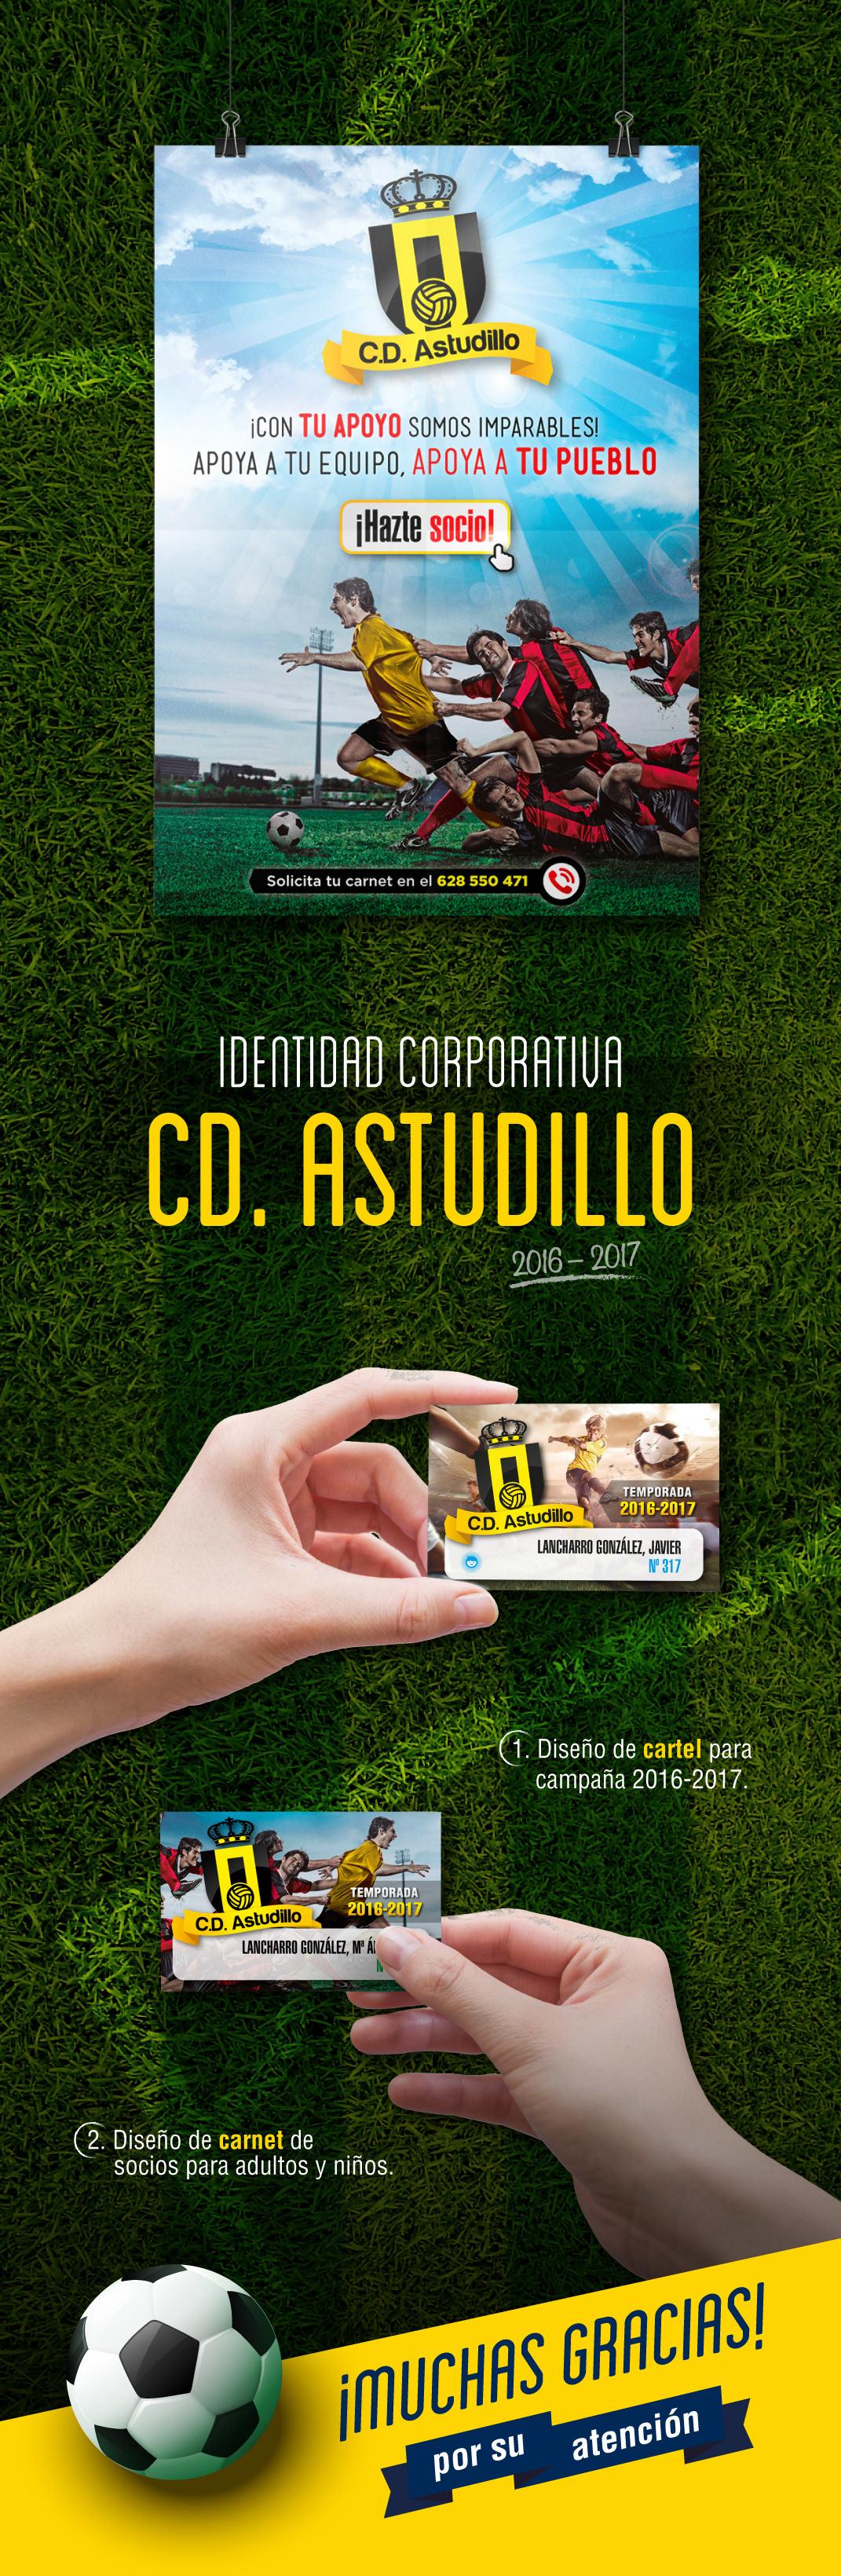 identidad-corporativa-cd-astudillo